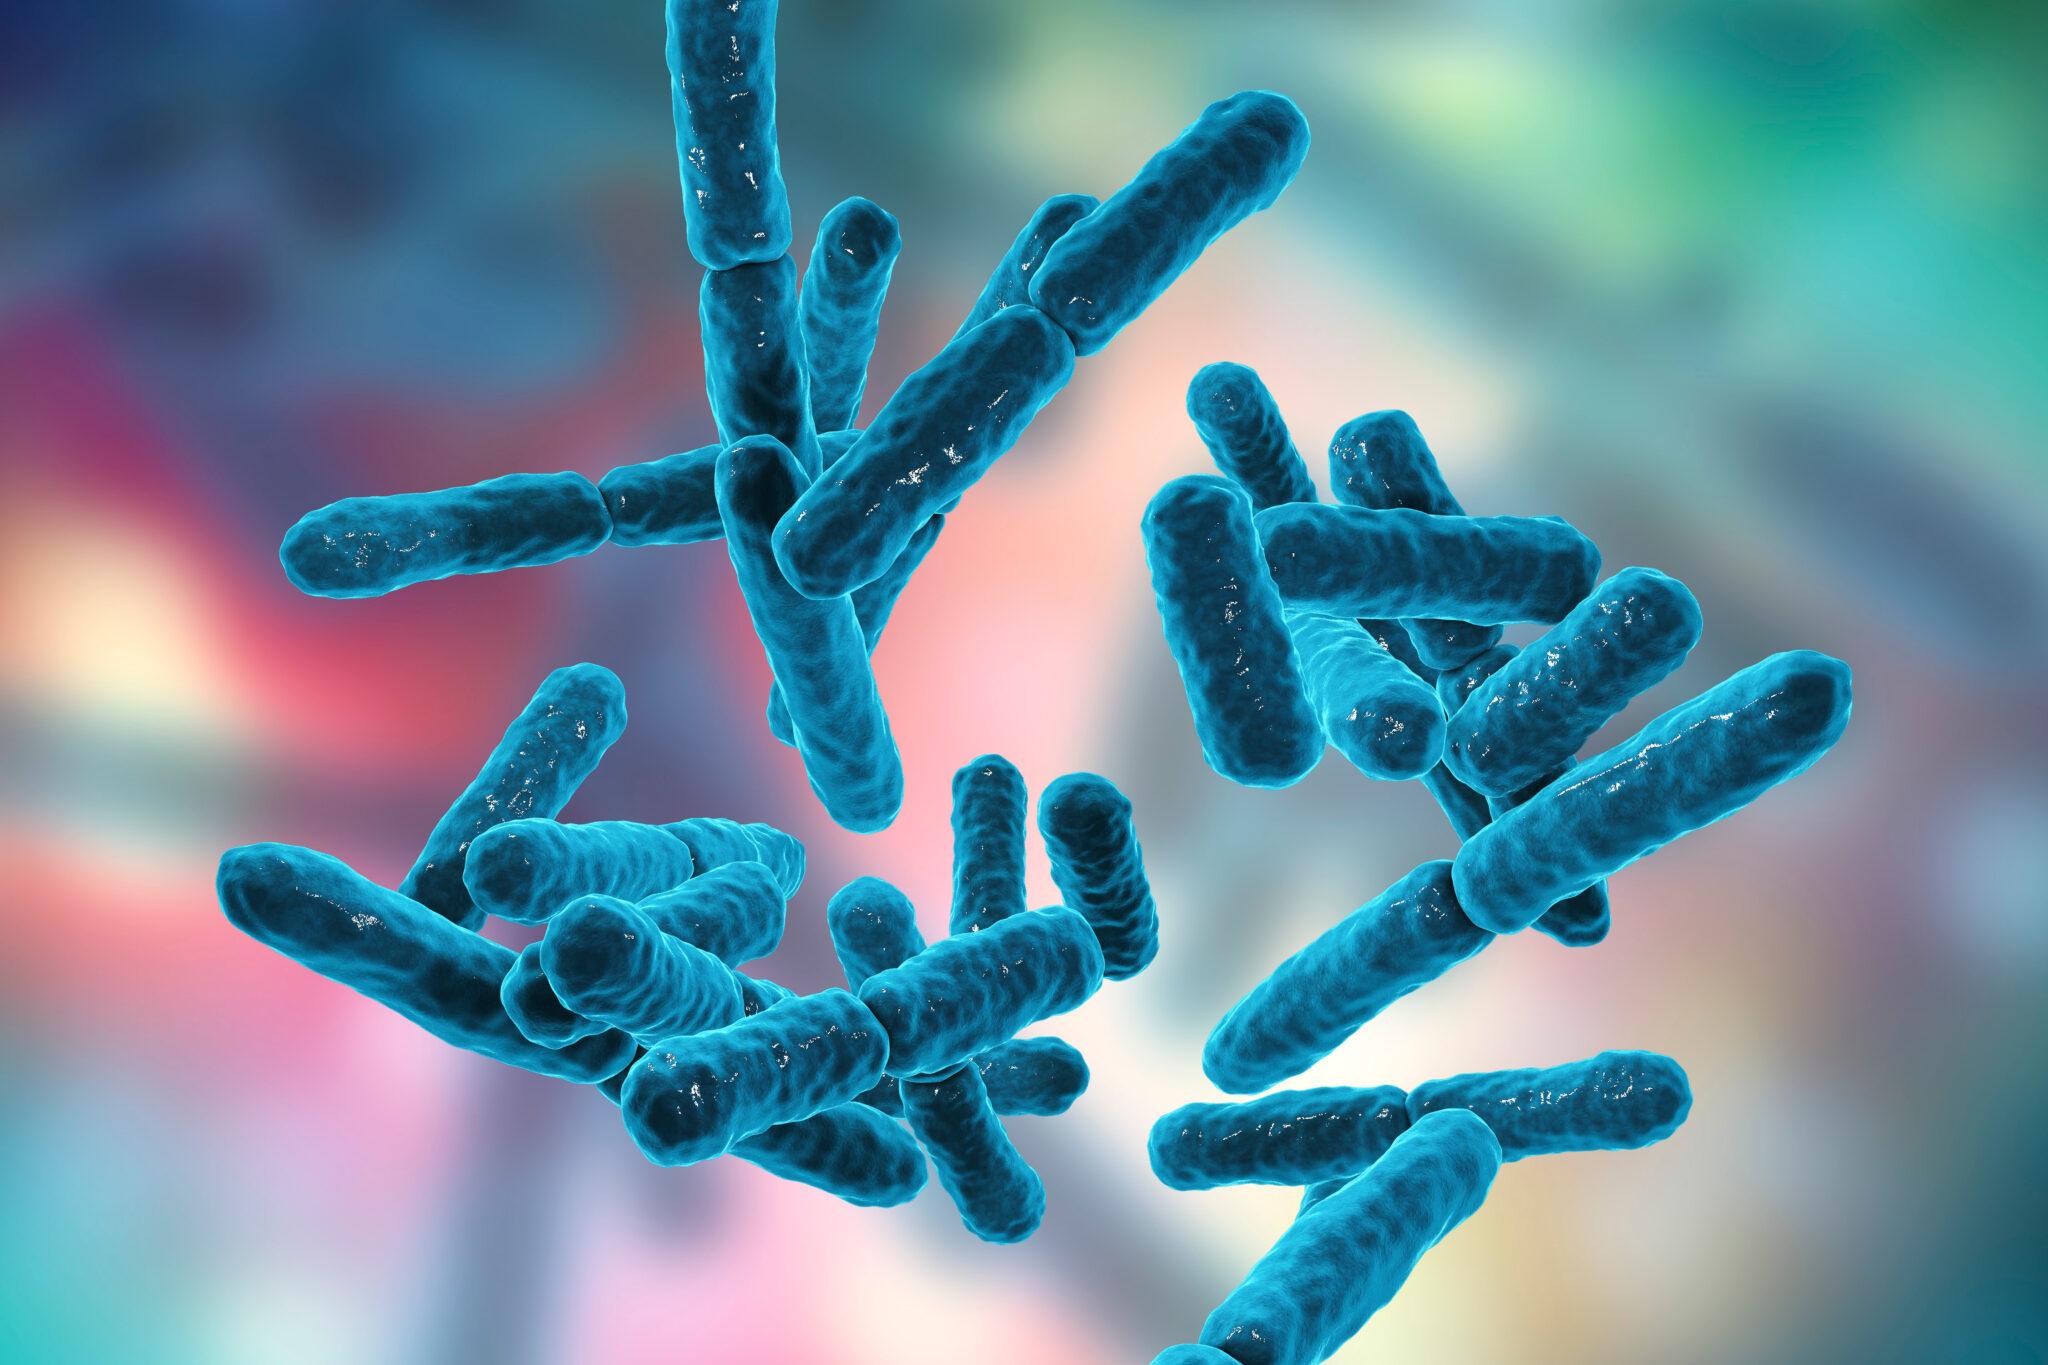 Bakterien animiert